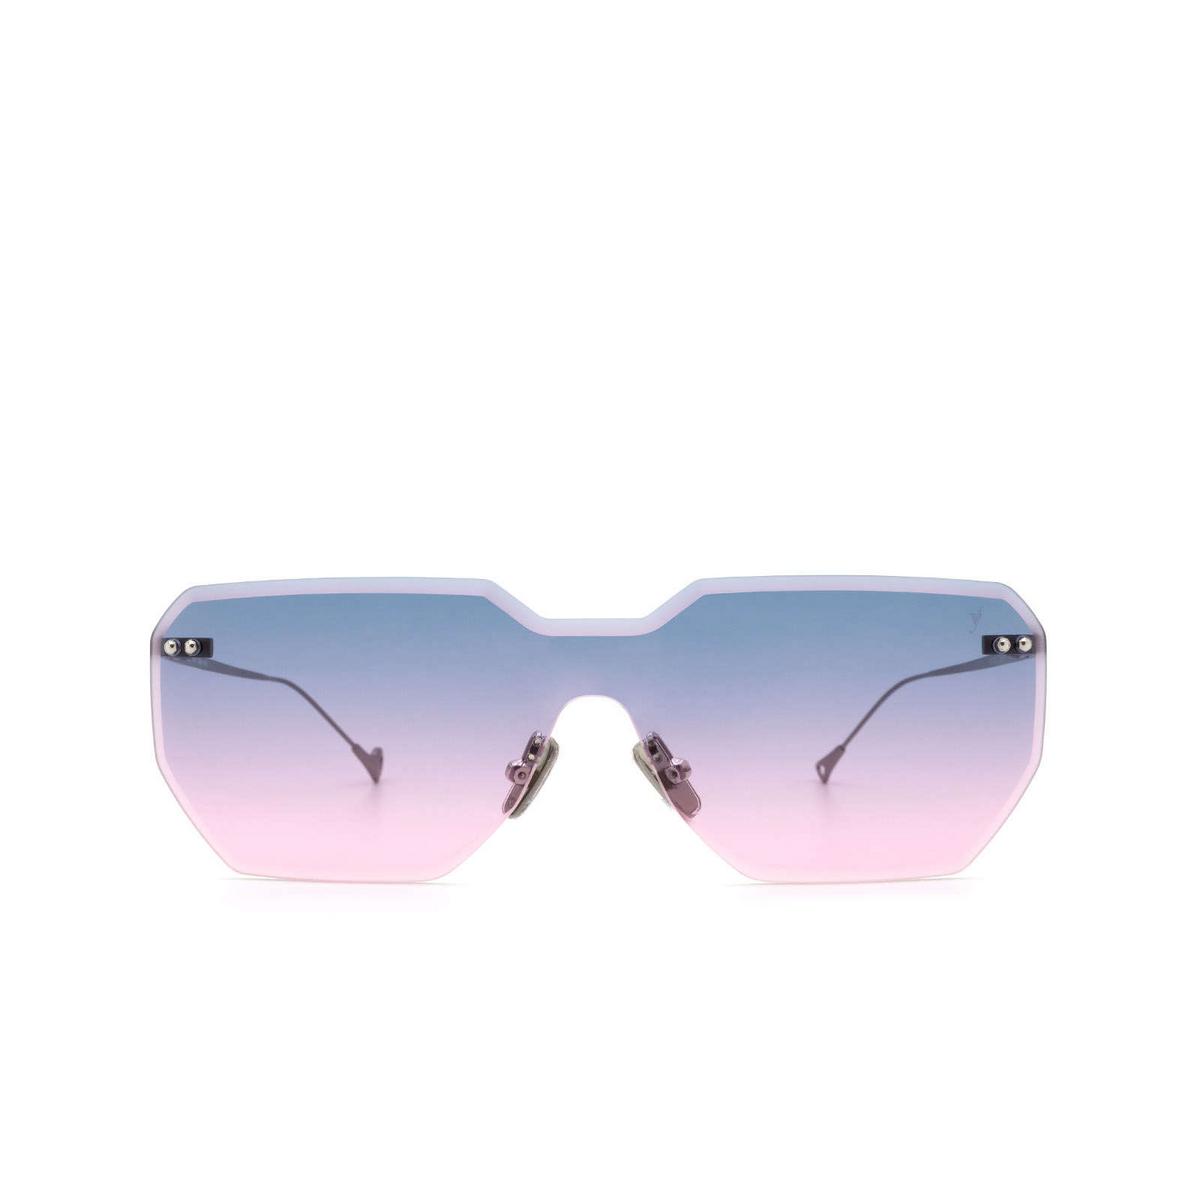 Eyepetizer® Mask Sunglasses: Brickel color Gunmetal C.3-20 - front view.